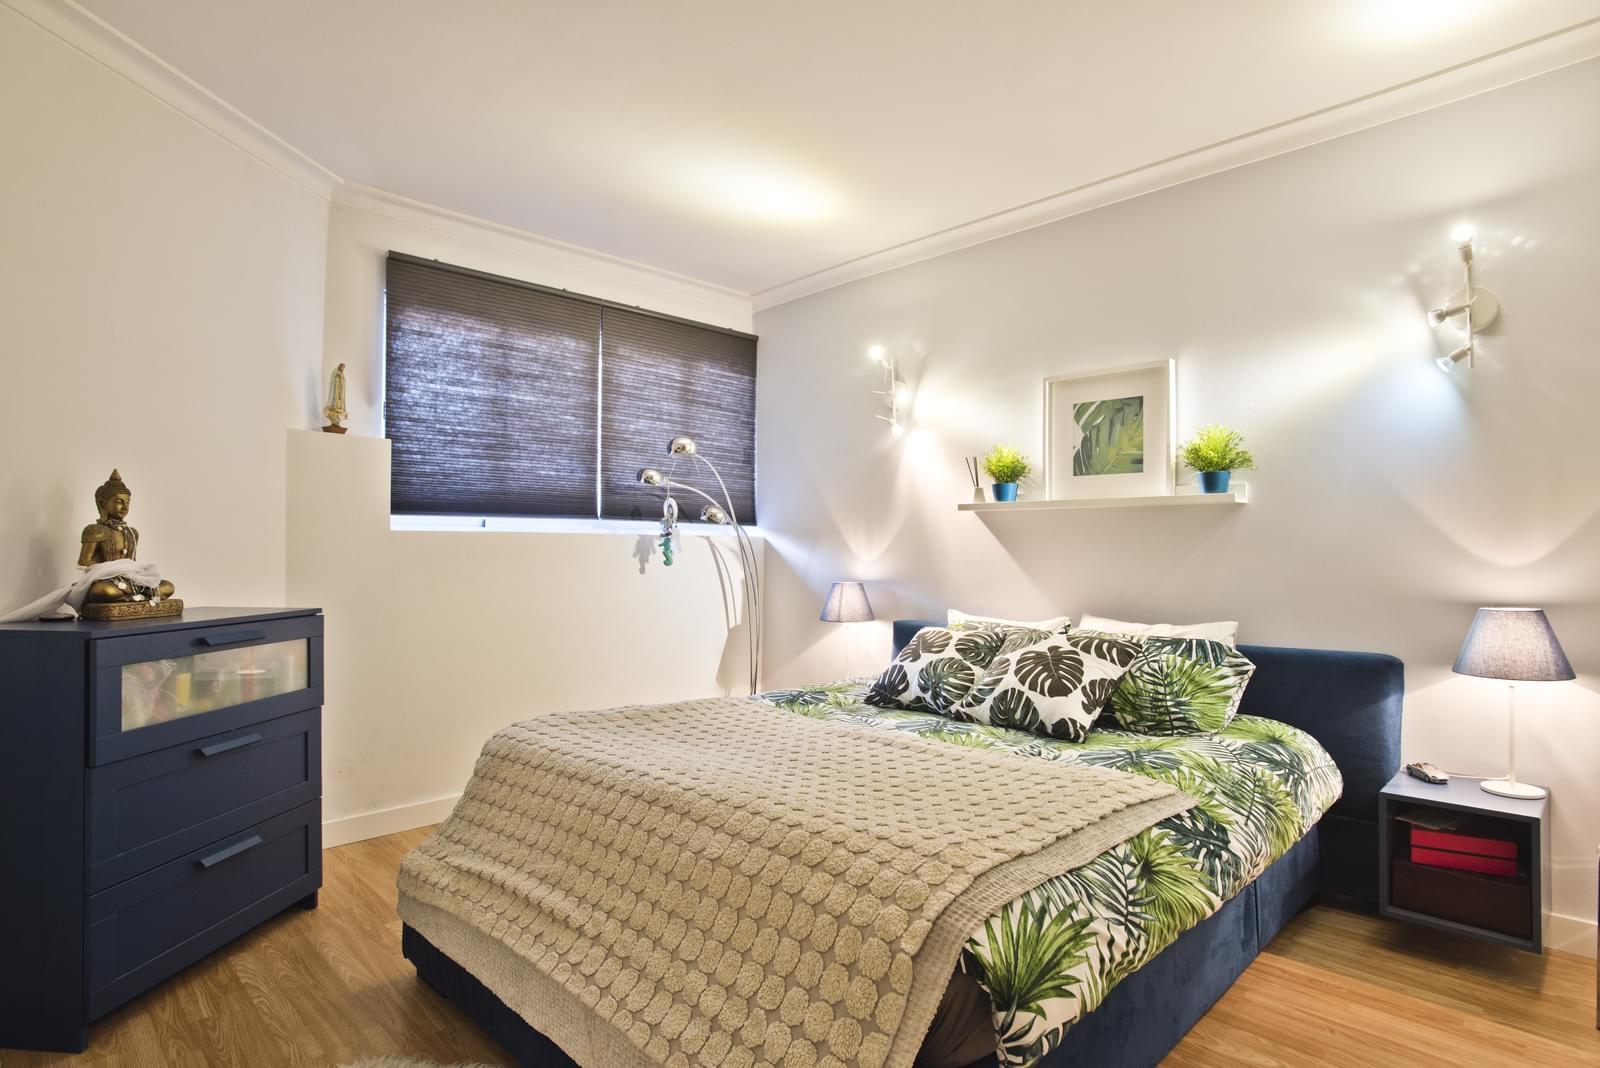 pf17010-apartamento-t4-cascais-04b8e2f9-b17c-4f9a-bd96-8a5635506ba6